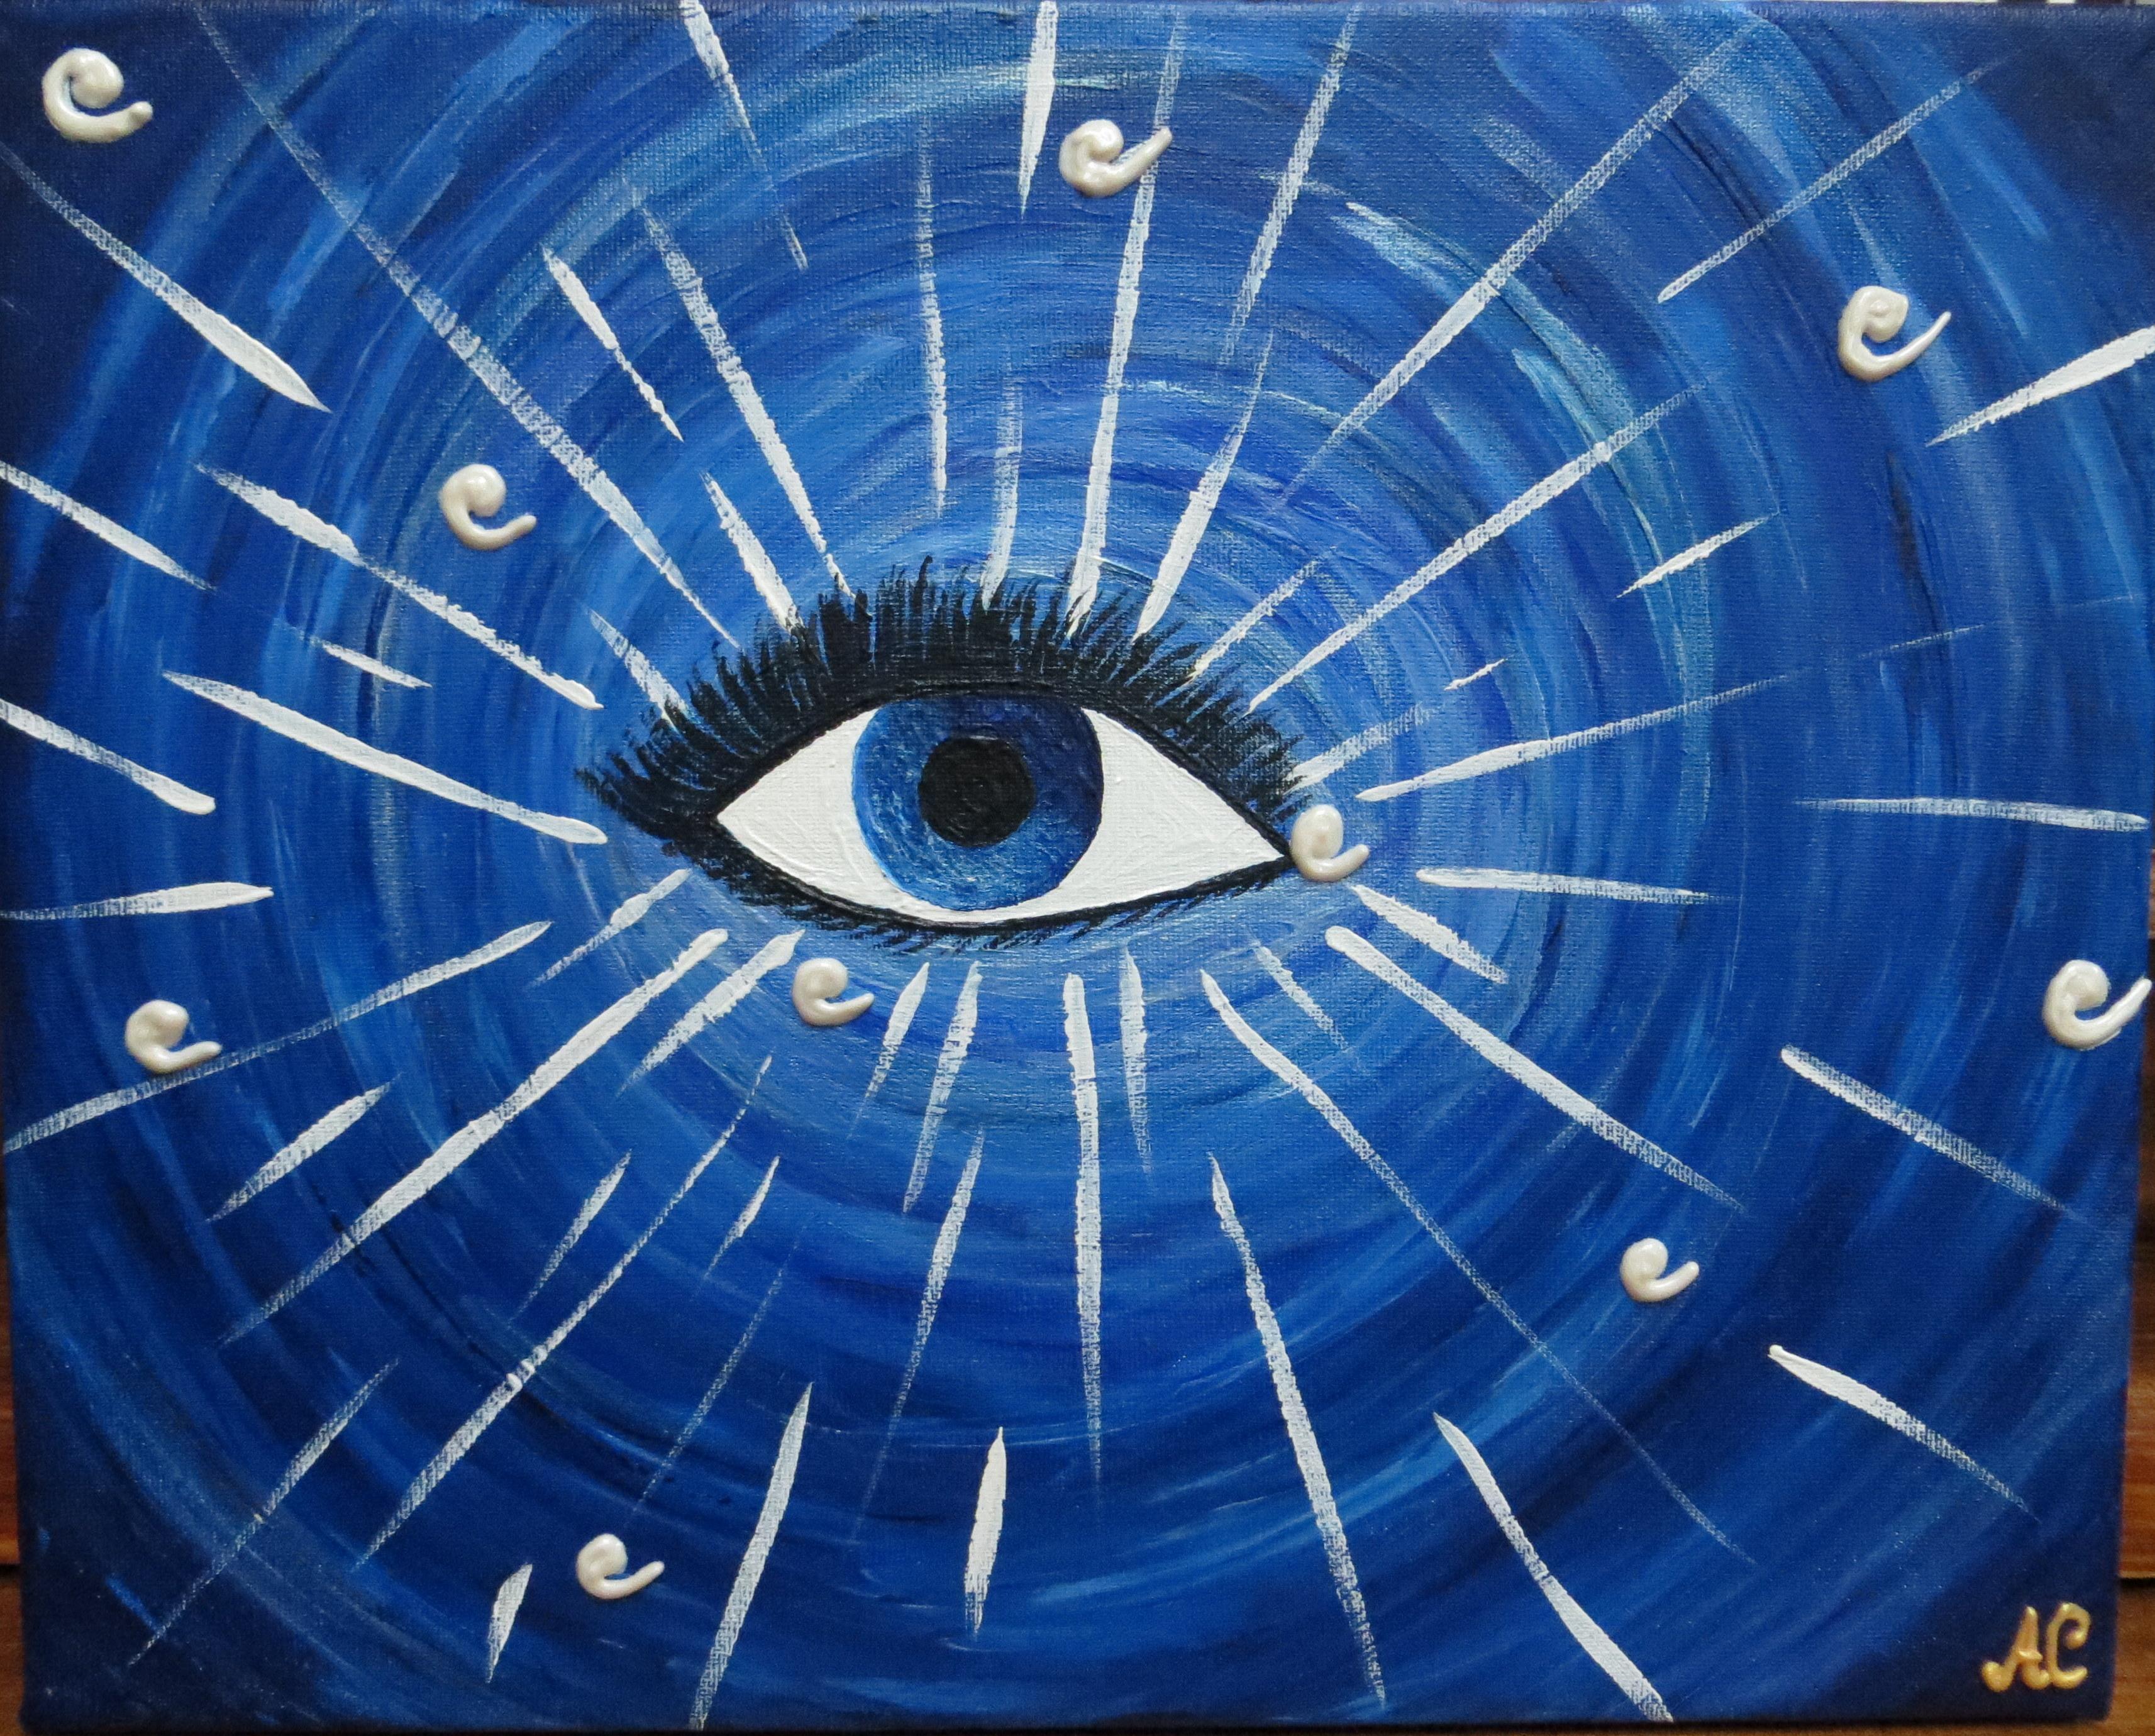 L'Oeil spirituel